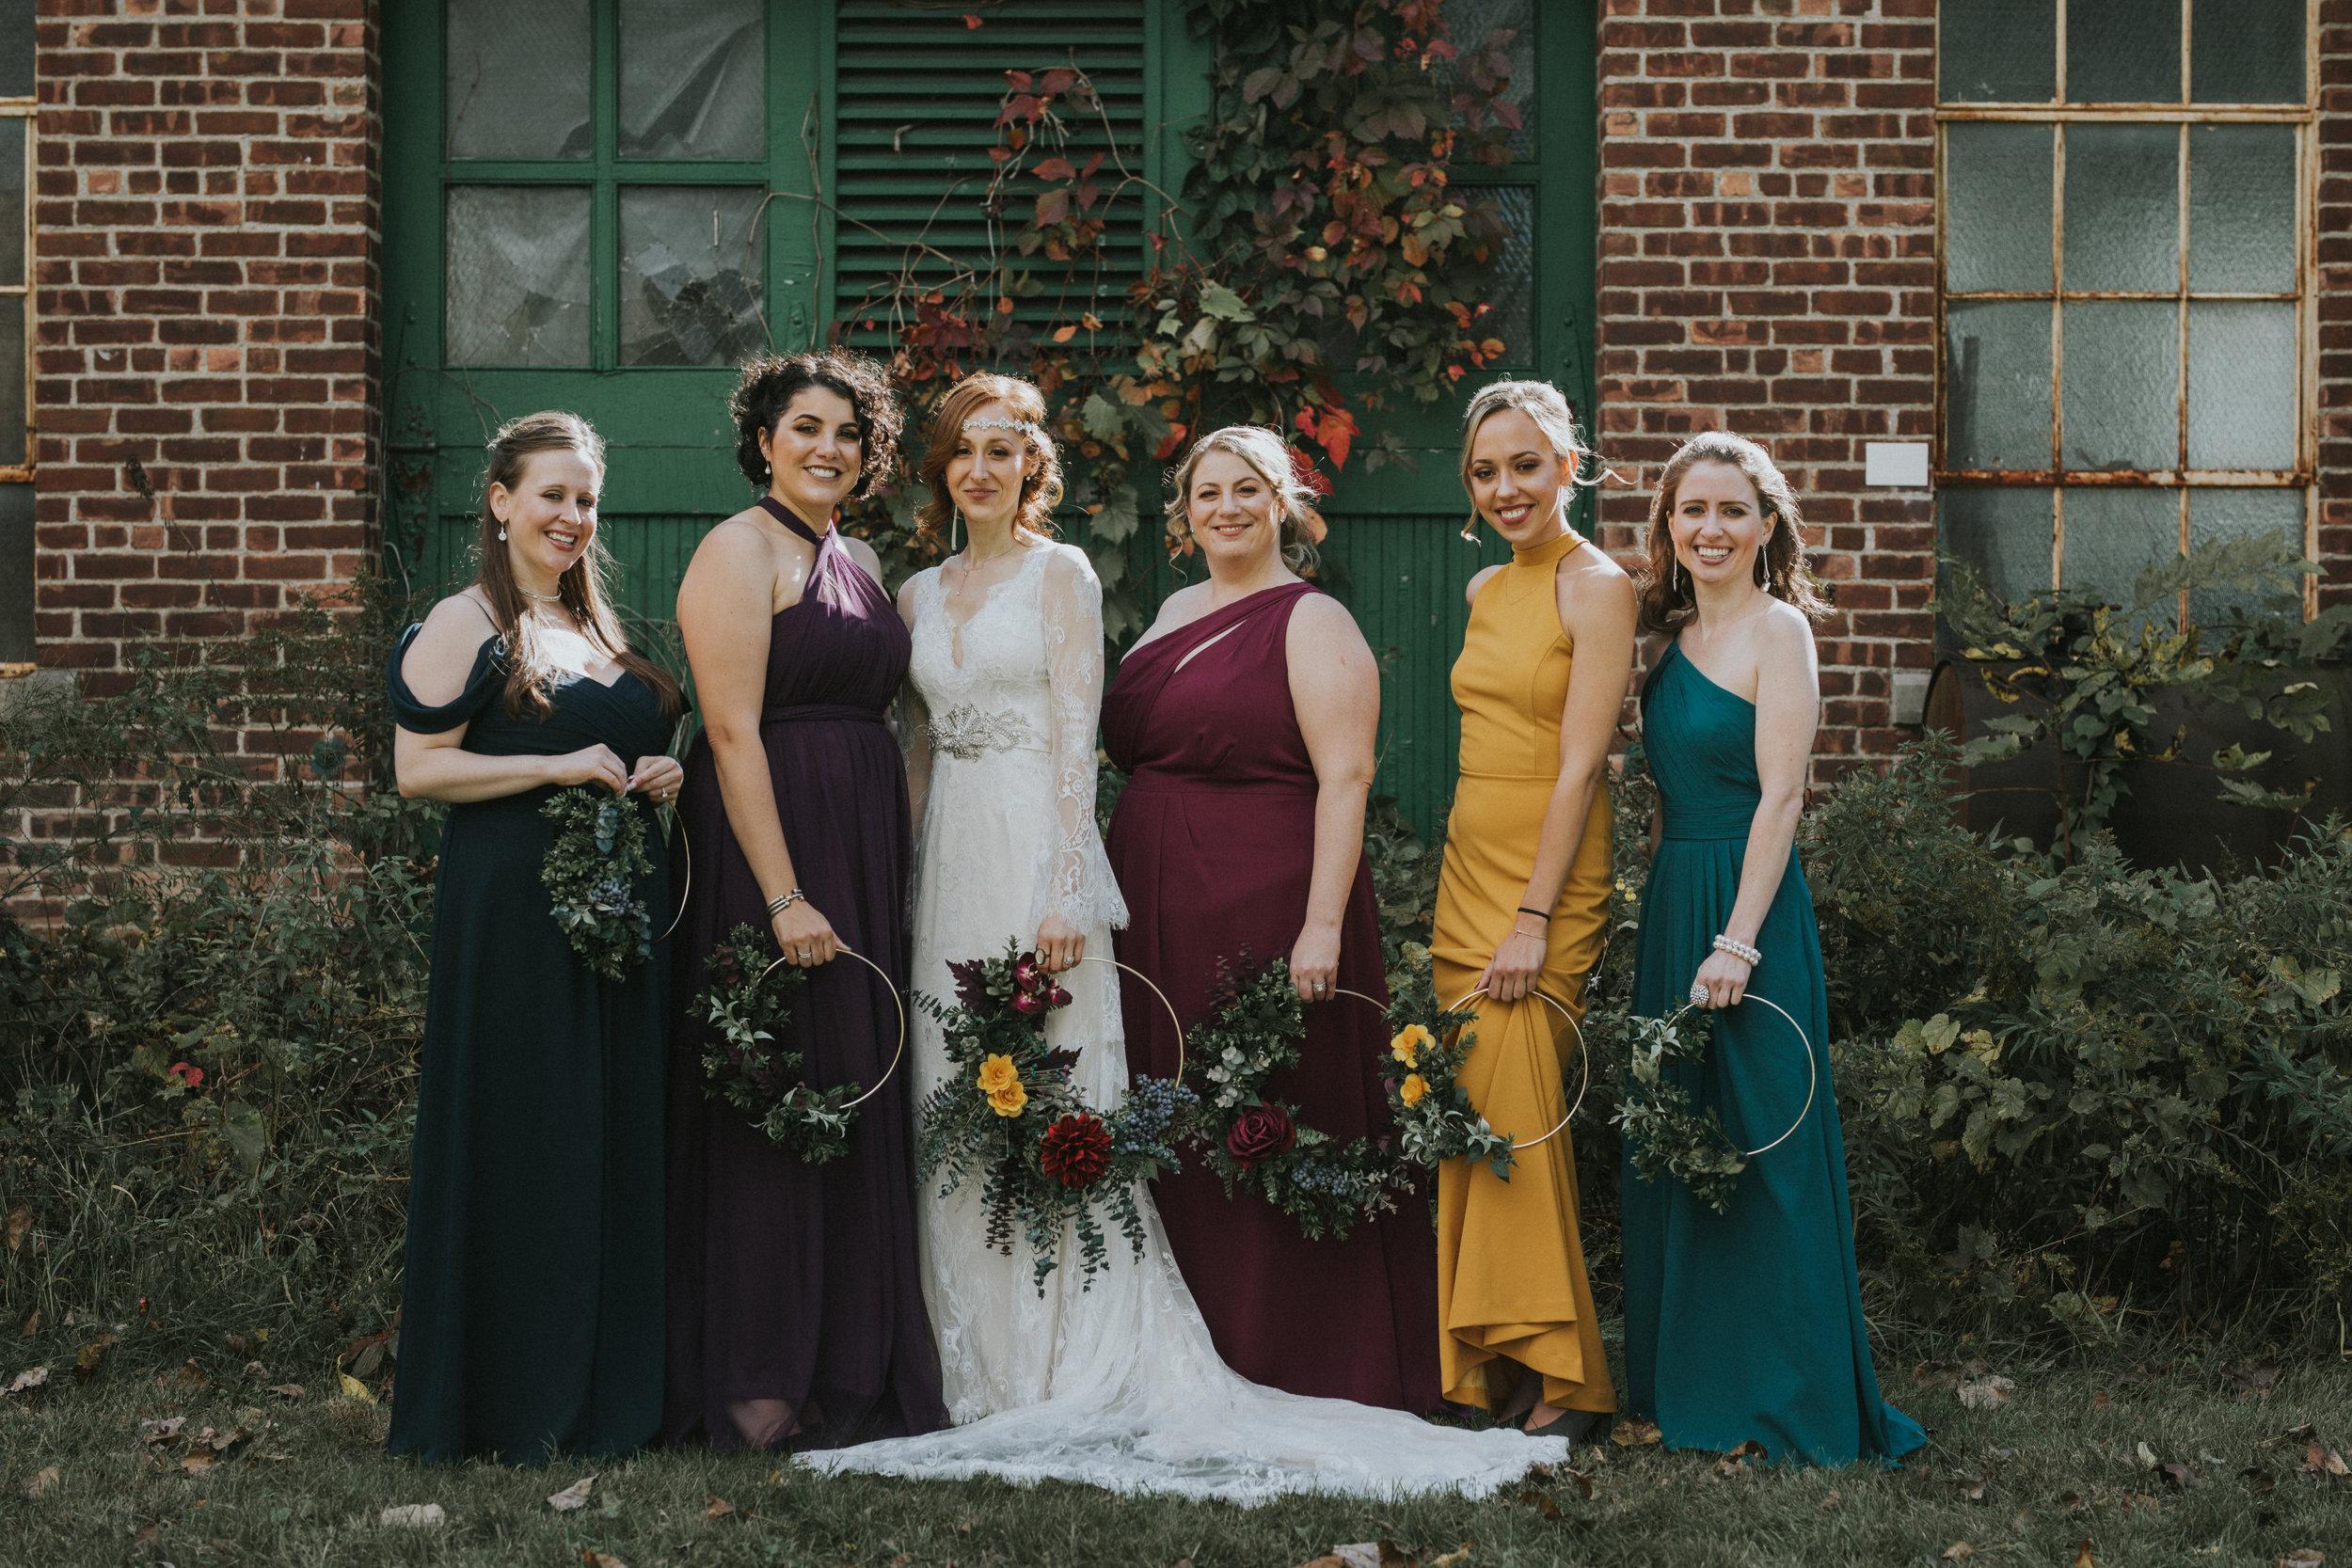 shaker_heritage_barn_wedding_008.jpg